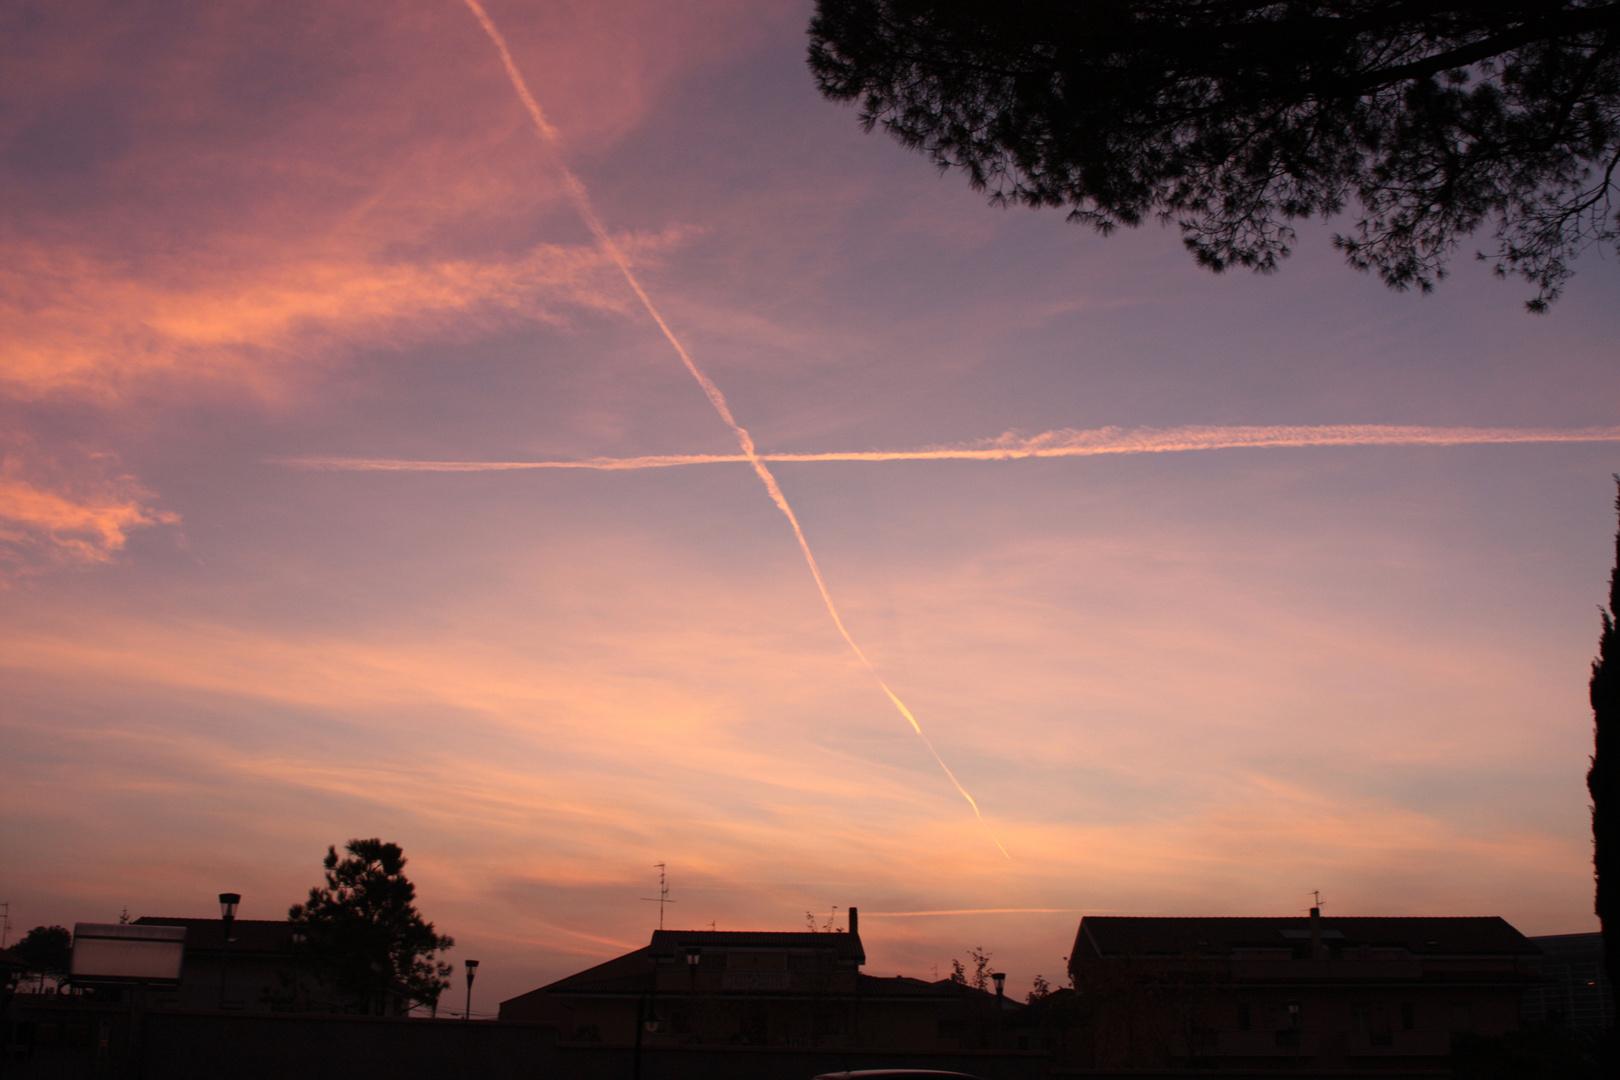 Incroci aerei all'imbrunire